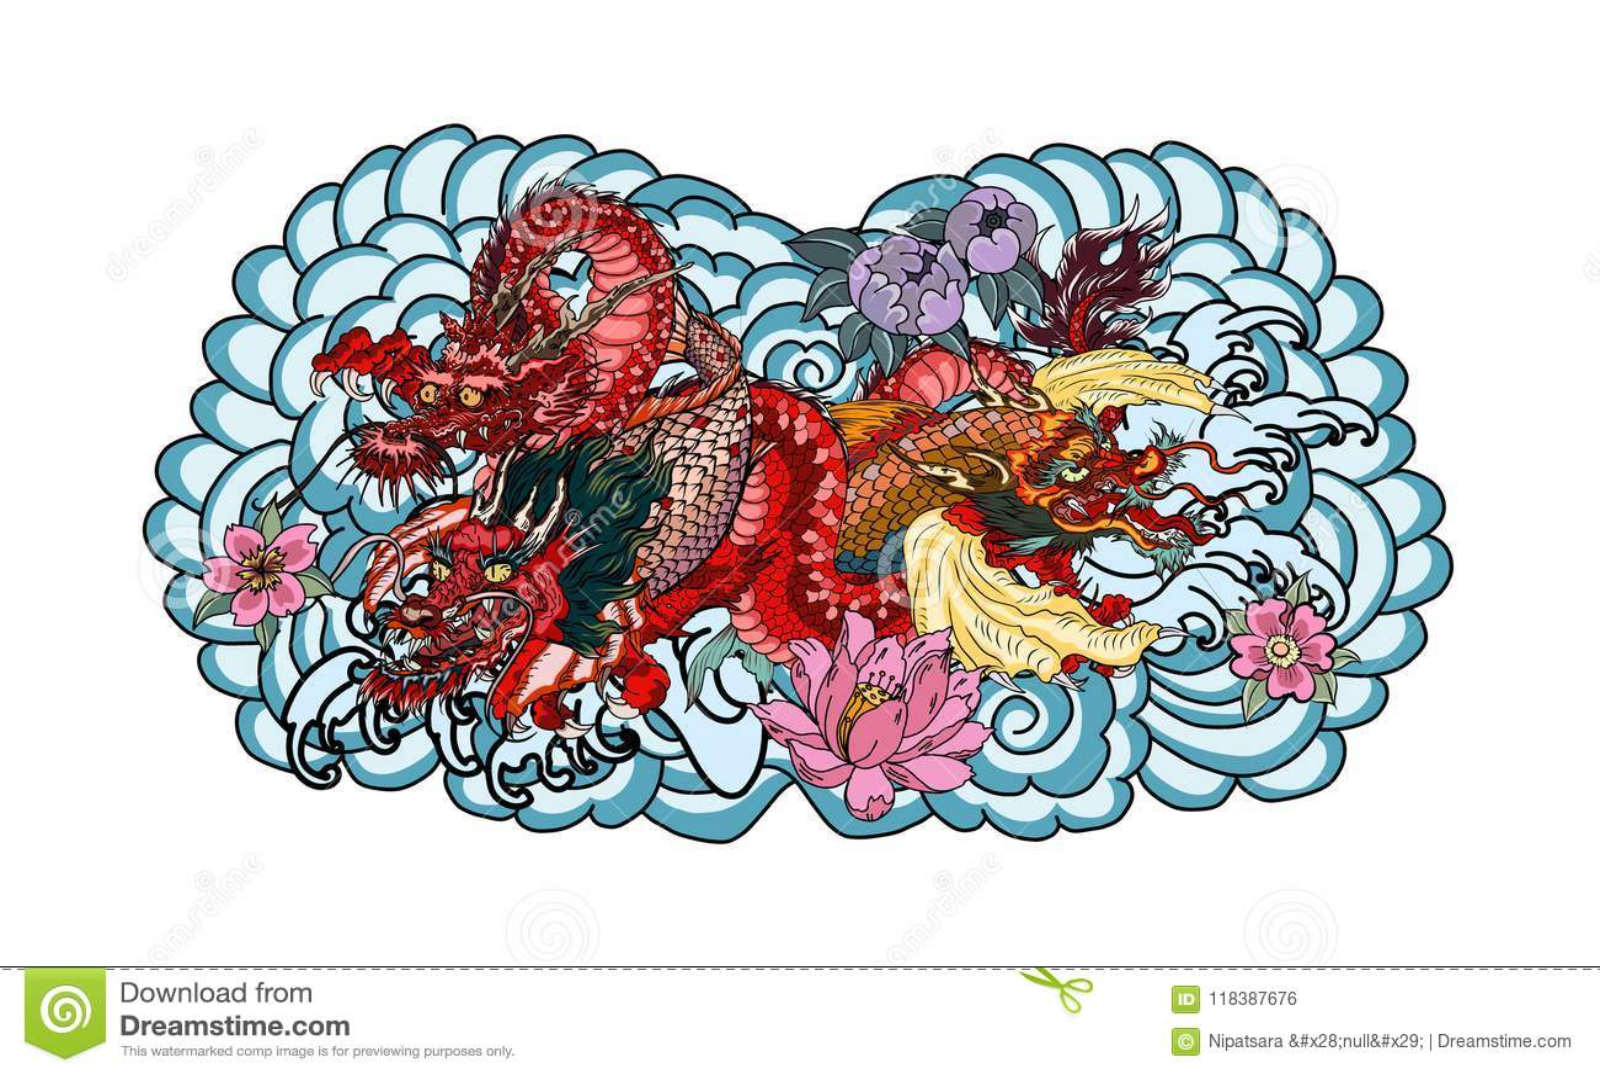 Dragon With Koi Dragon And Lotus Flower Tattooach With Sakura And